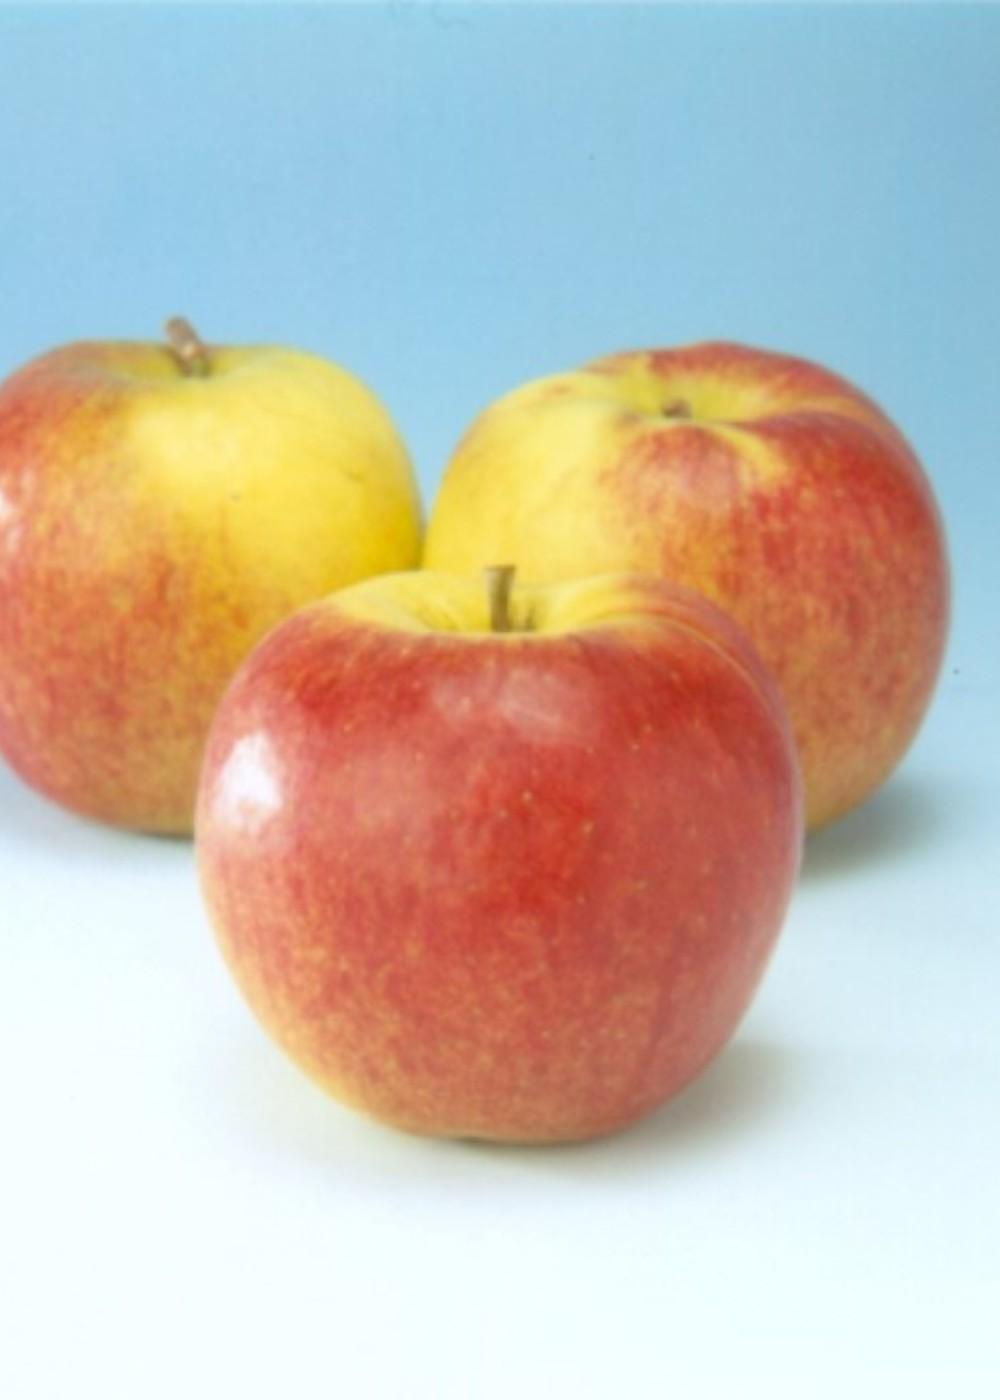 Apfel 'Jonagold' | Malus domestica 'Jonagold'